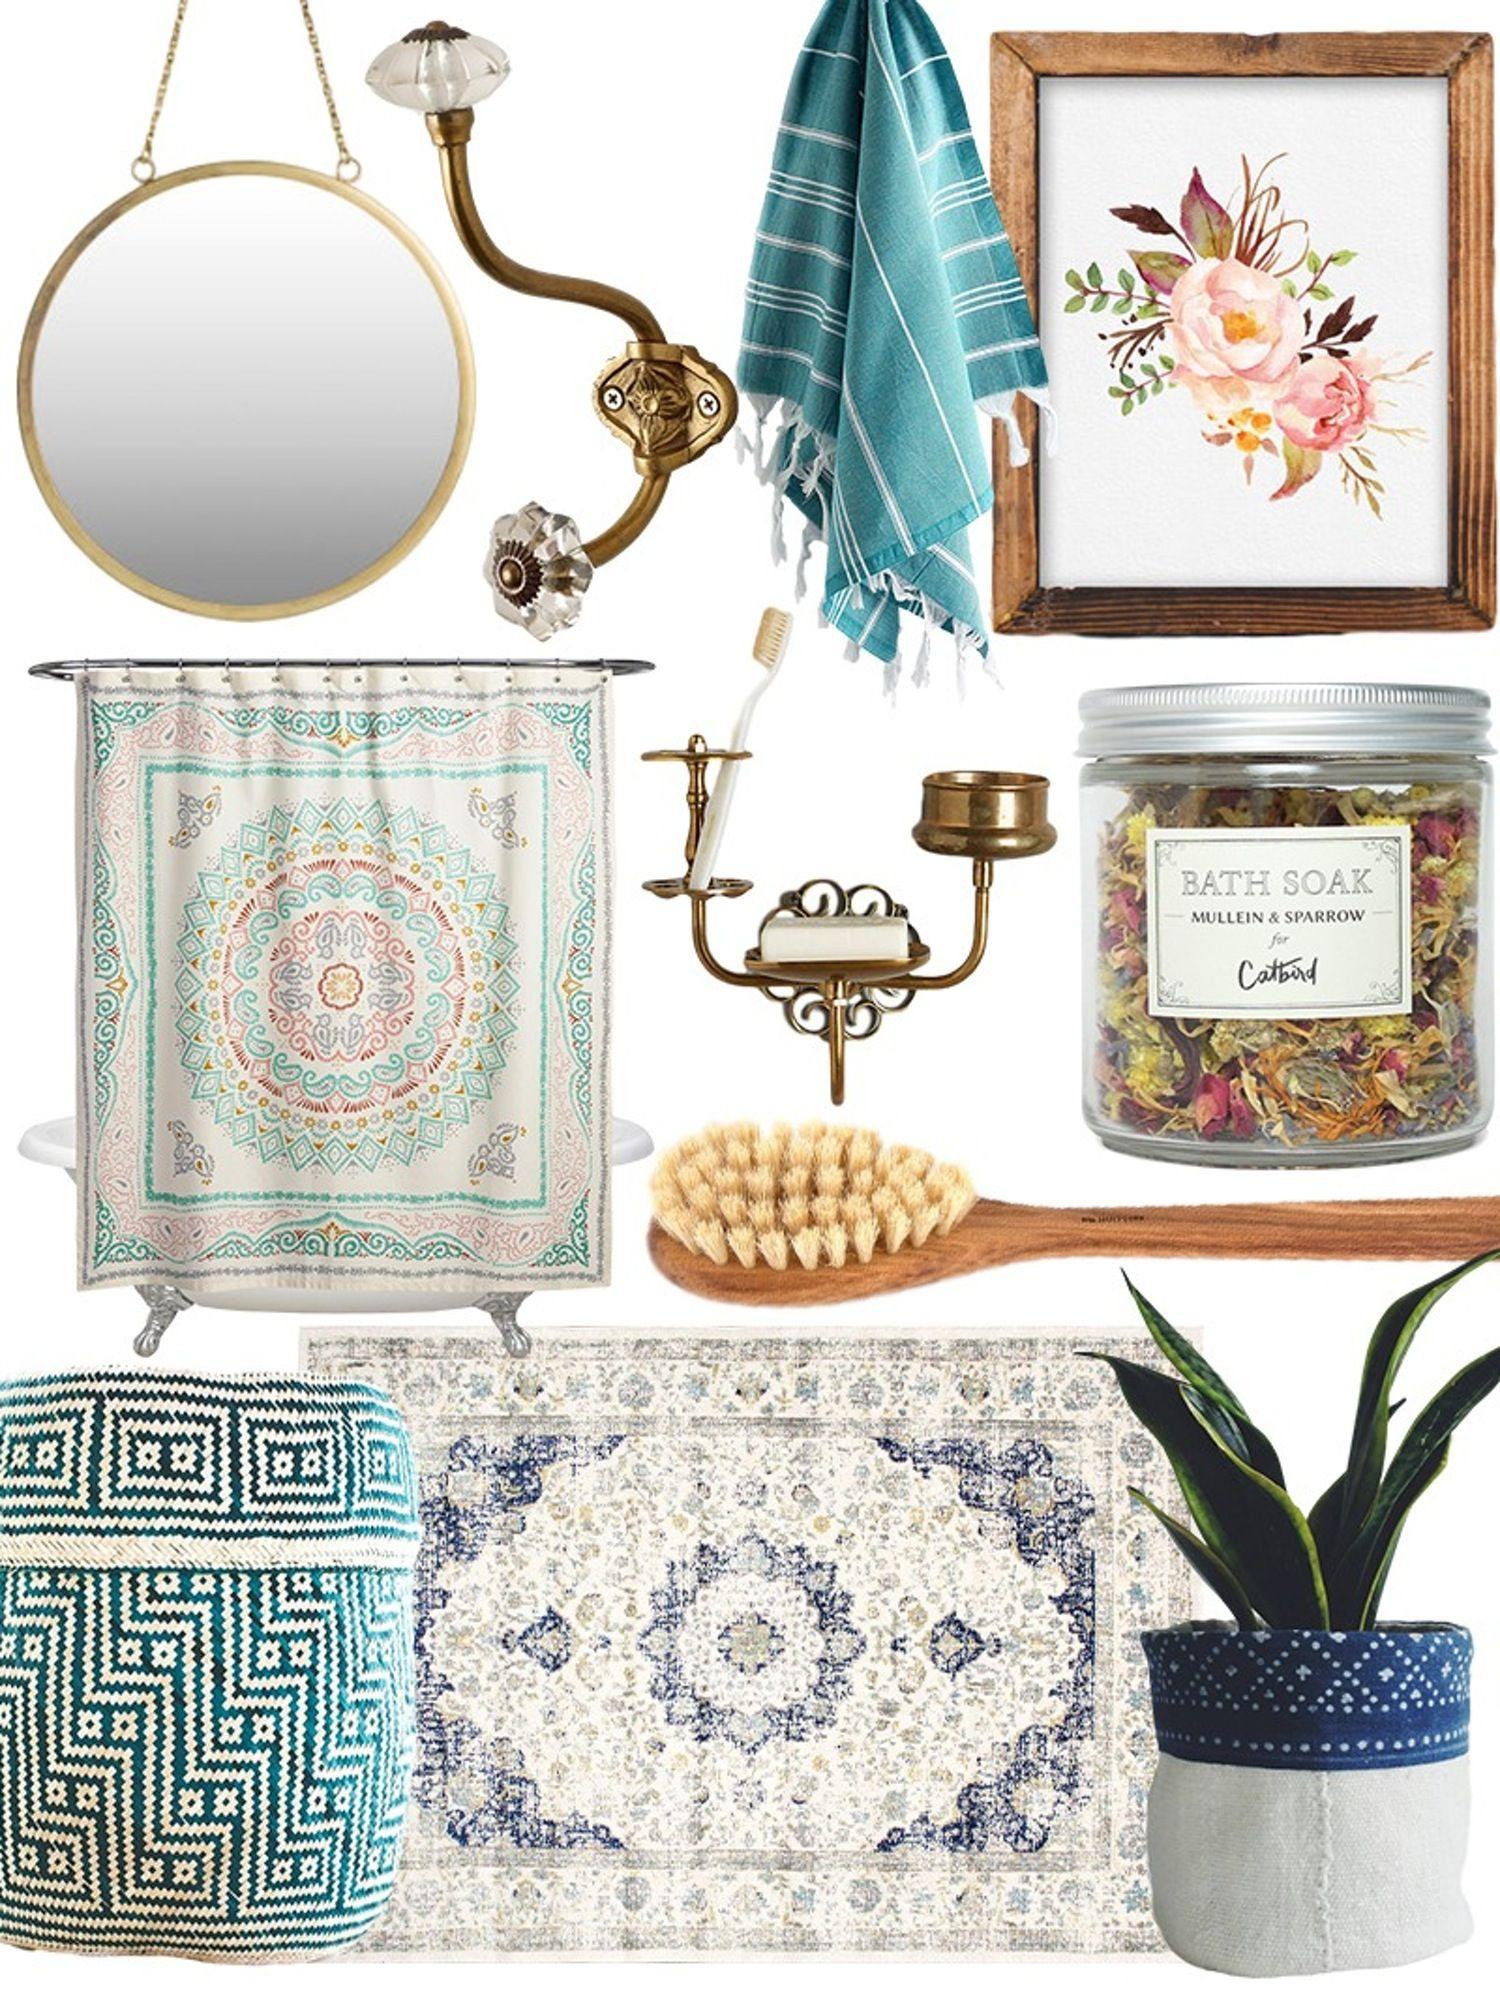 Photo of Create the Look: Artful Bohemian Bathroom Shopping Guide